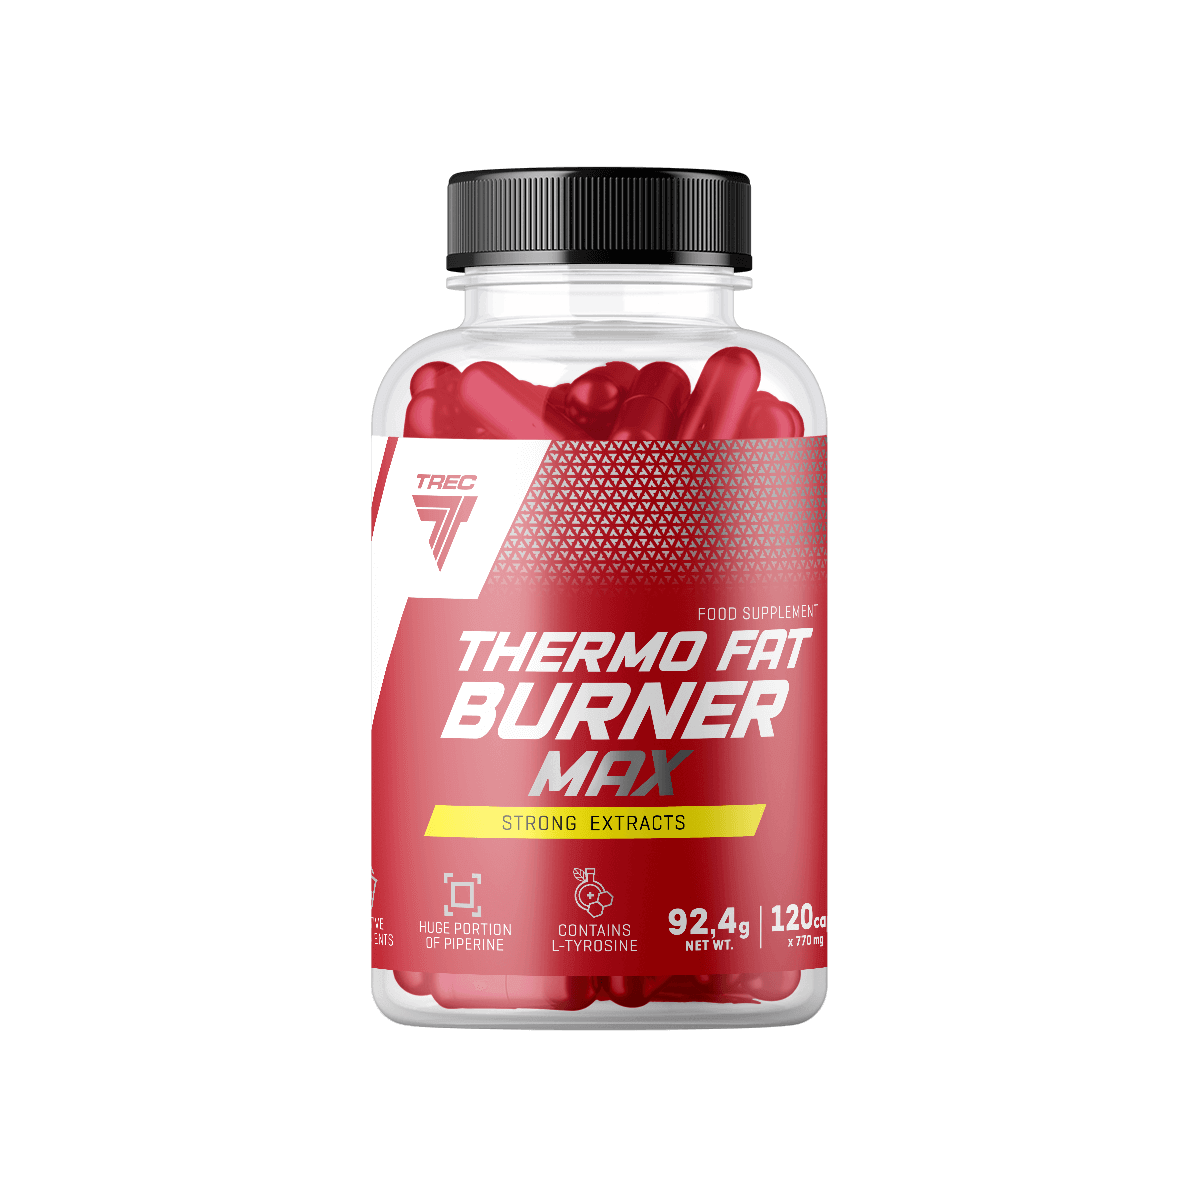 Thermo fat burn